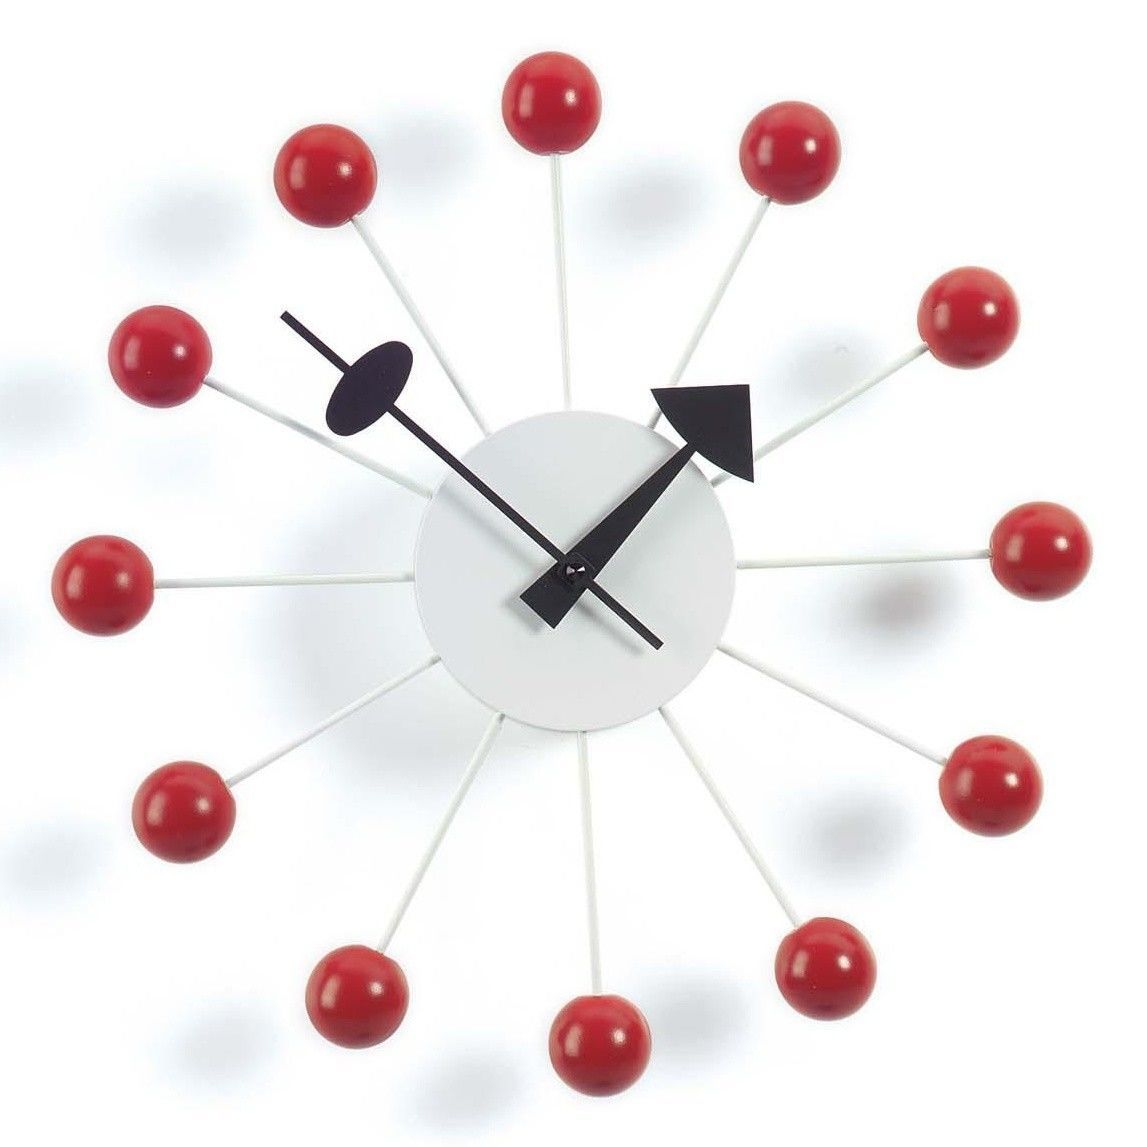 ball clock nelson  vitra  ambientedirectcom - vitra  ball clock nelson  redhands blackwoodØcm